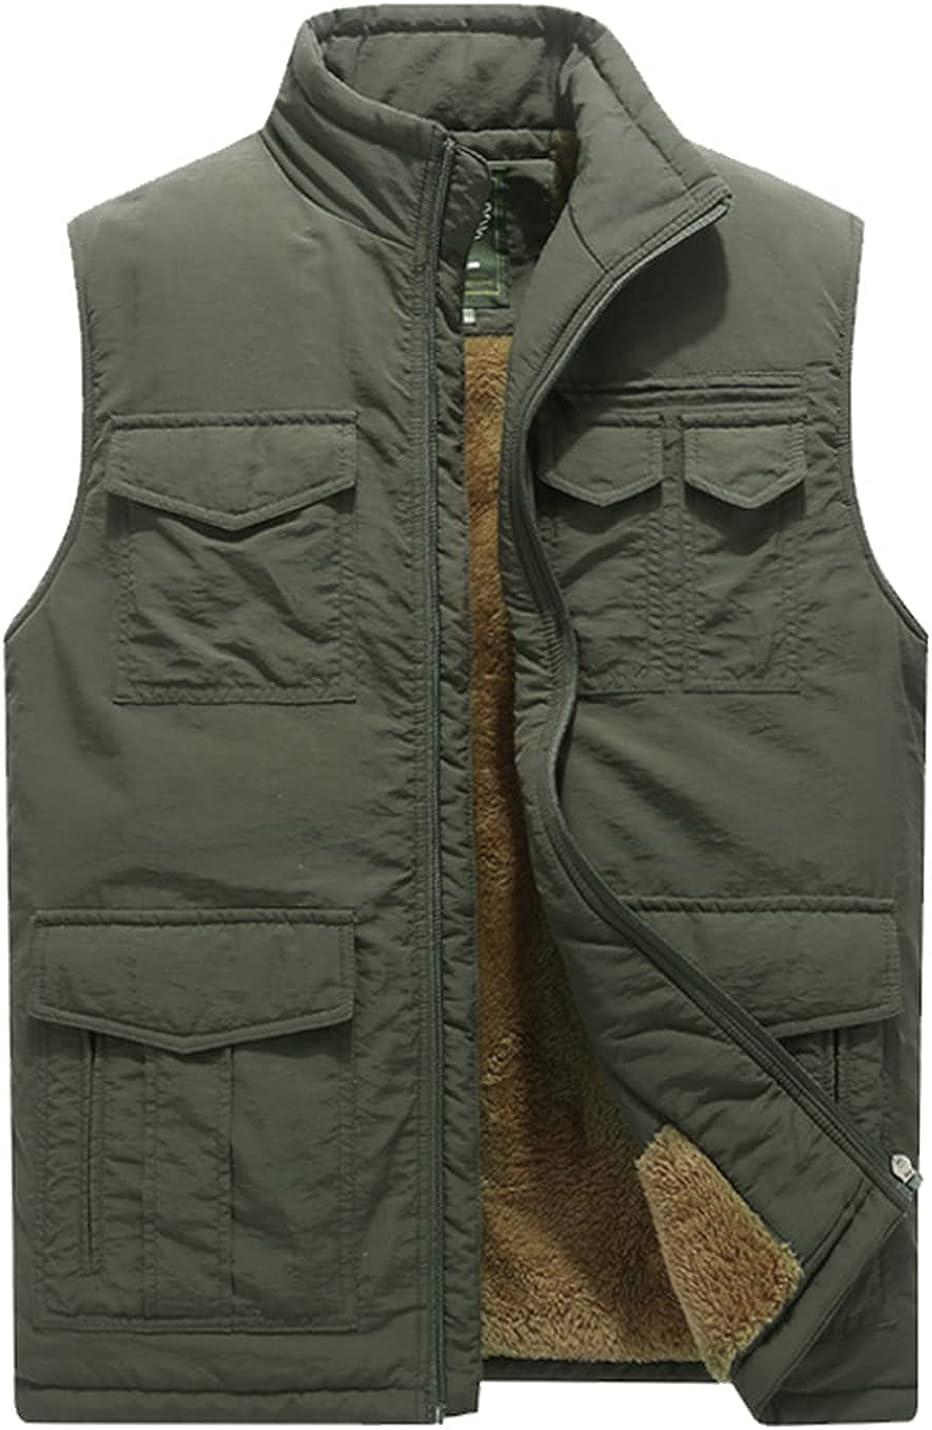 Kissonic Cheap SALE Start Men's Cheap bargain Winter Thicken Fleece Warm Vest Sleeveless Lined